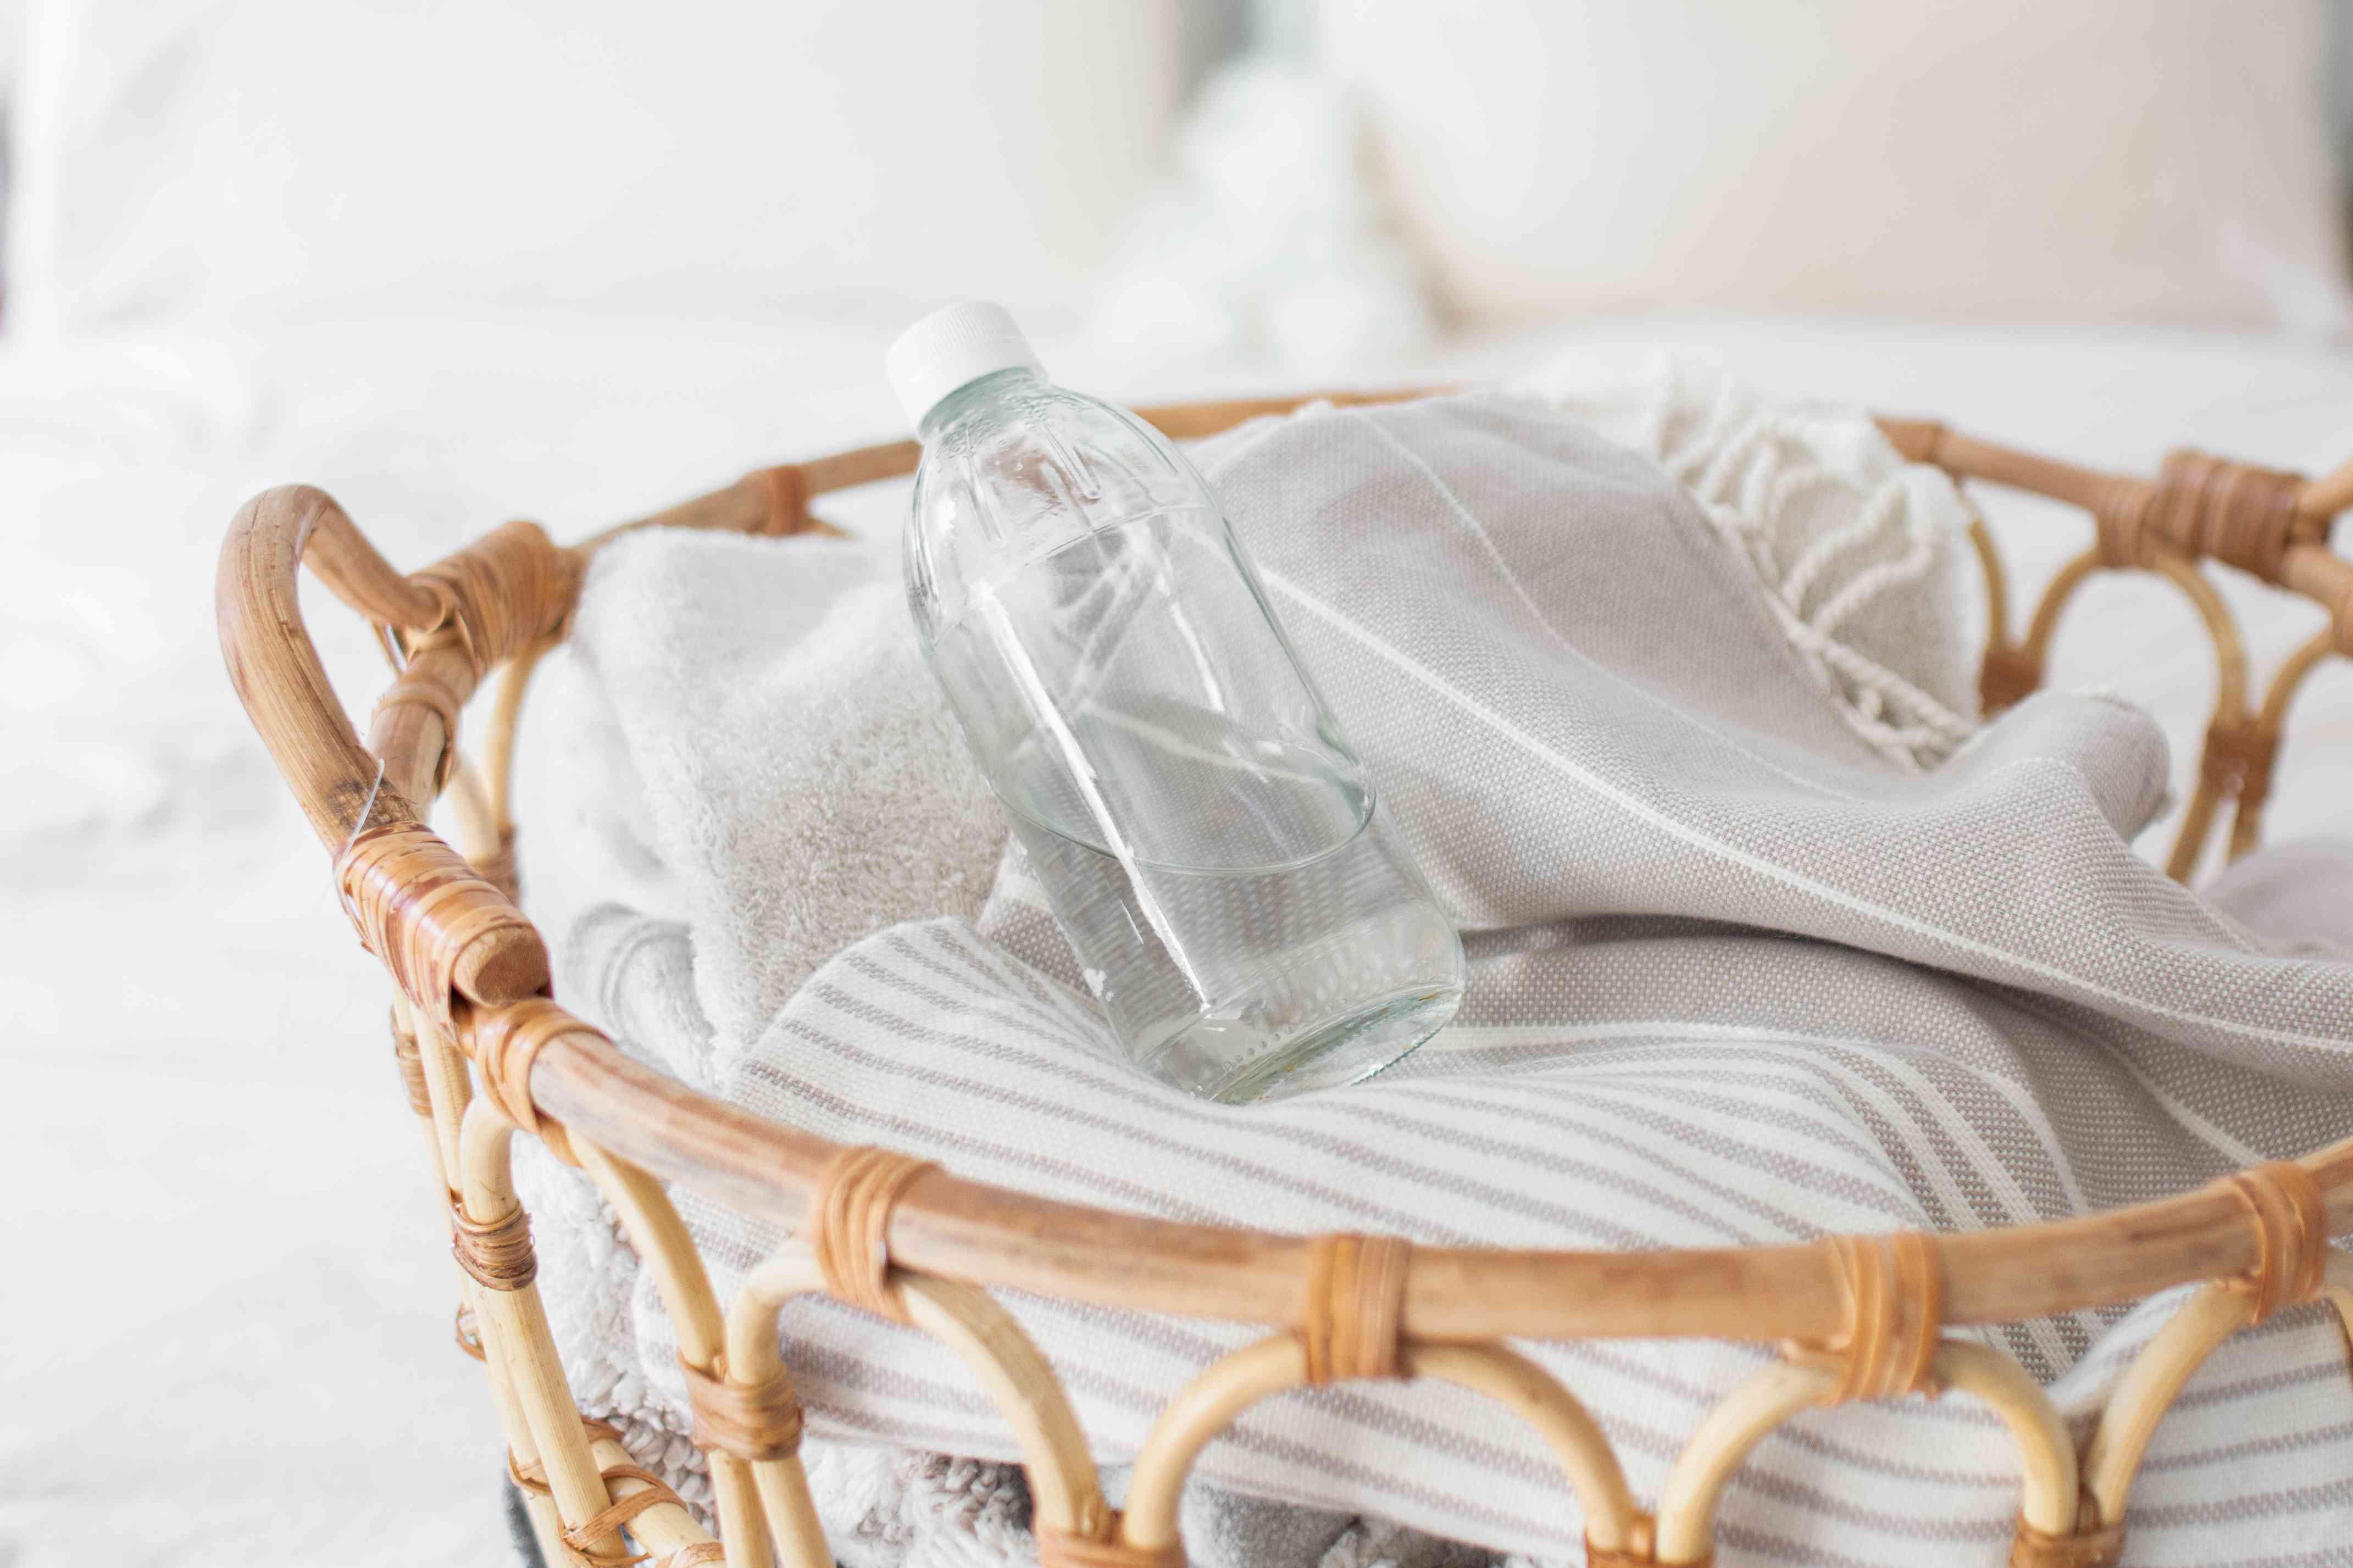 distilled white vinegar in a laundry basket